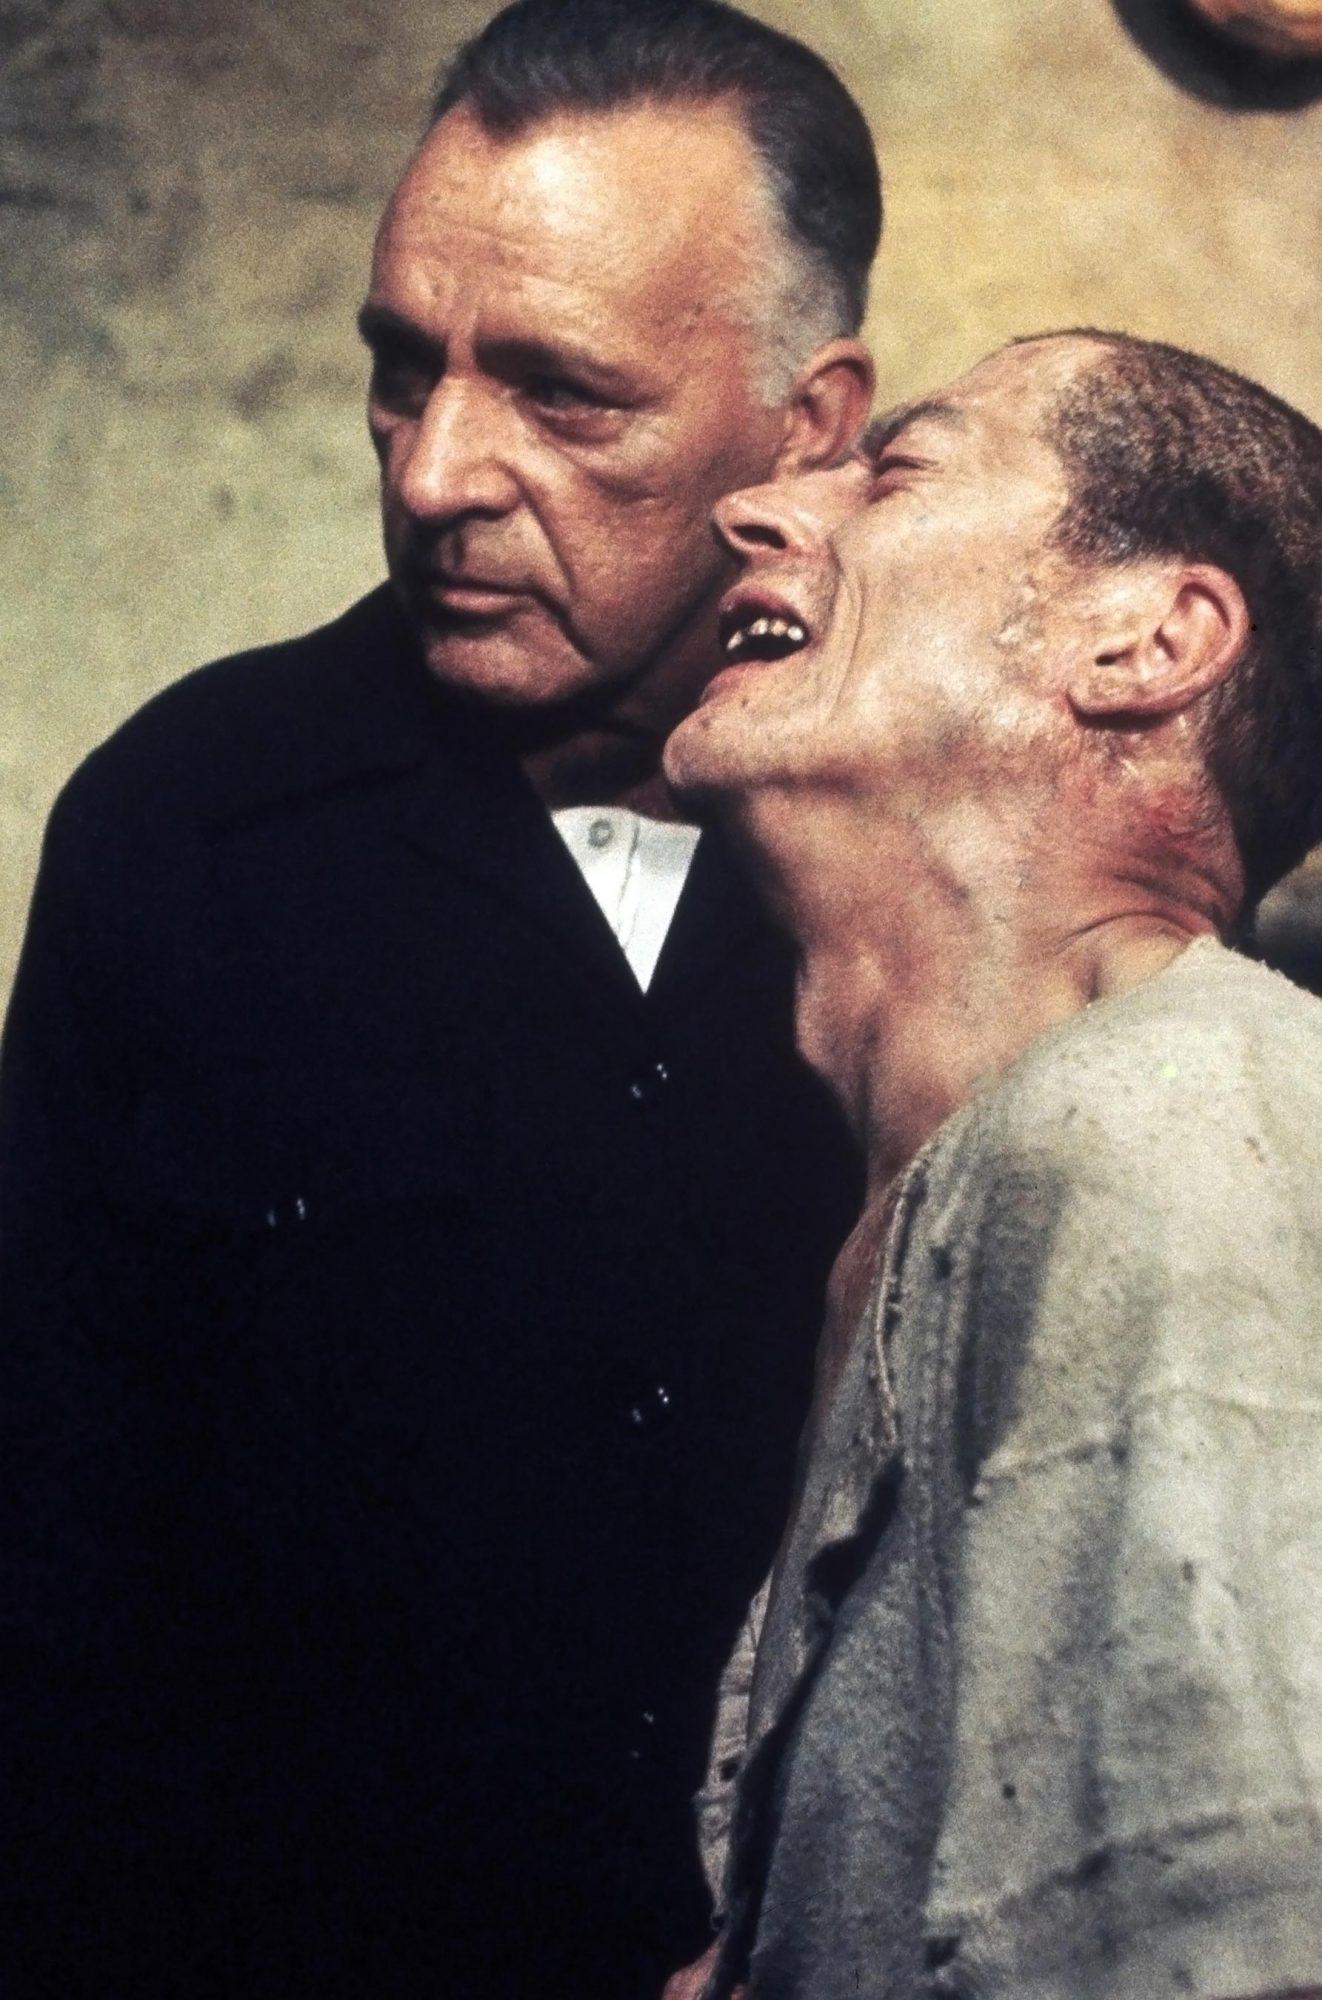 1984, Richard Burton, John Hurt, 1984, (c) Atlantic Releasing/courtesy Everett Collection